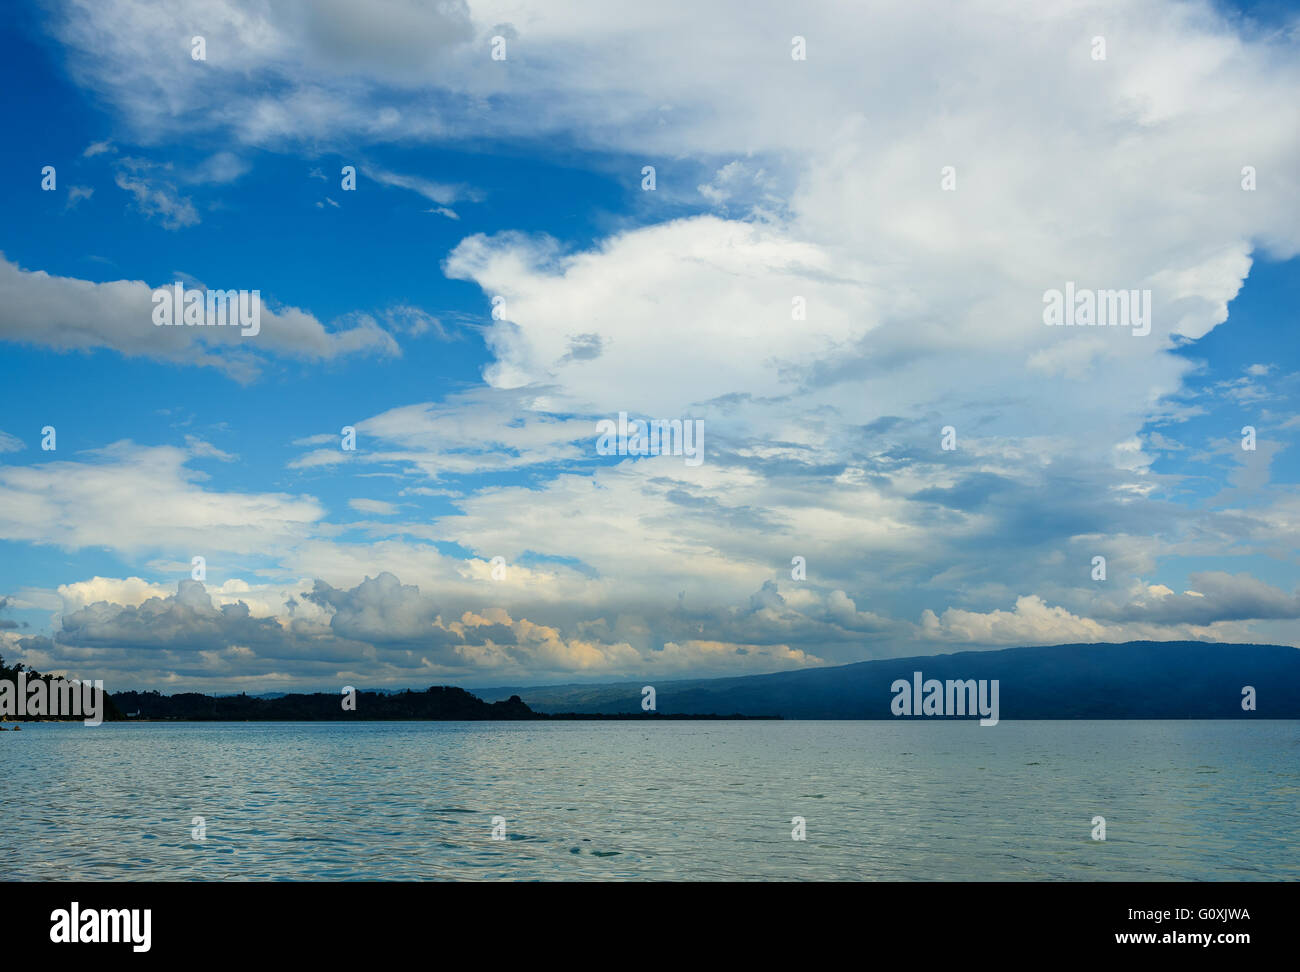 Poso lake. Central Sulawesi. Indonesia - Stock Image